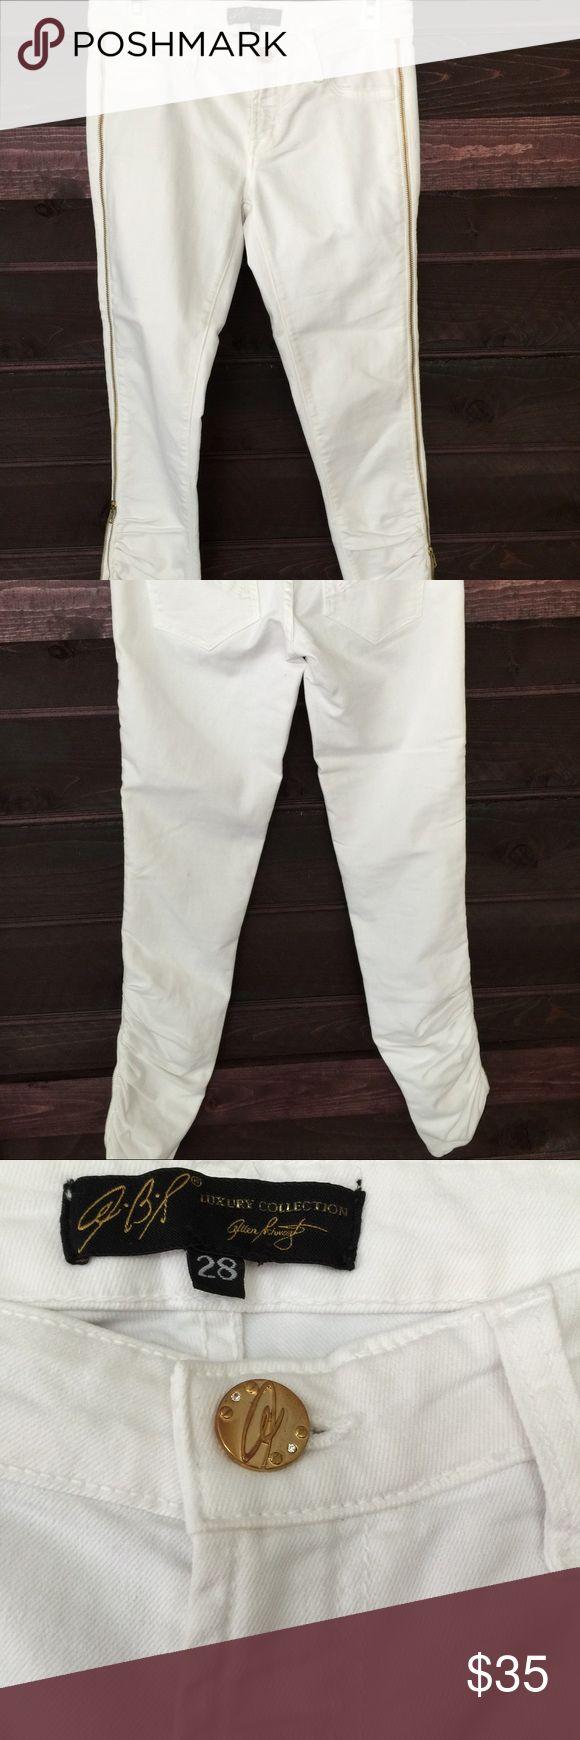 Allen B Schwartz slim jeans with side zipper Stretch jeans never worn Allen B Schwartz Jeans Skinny